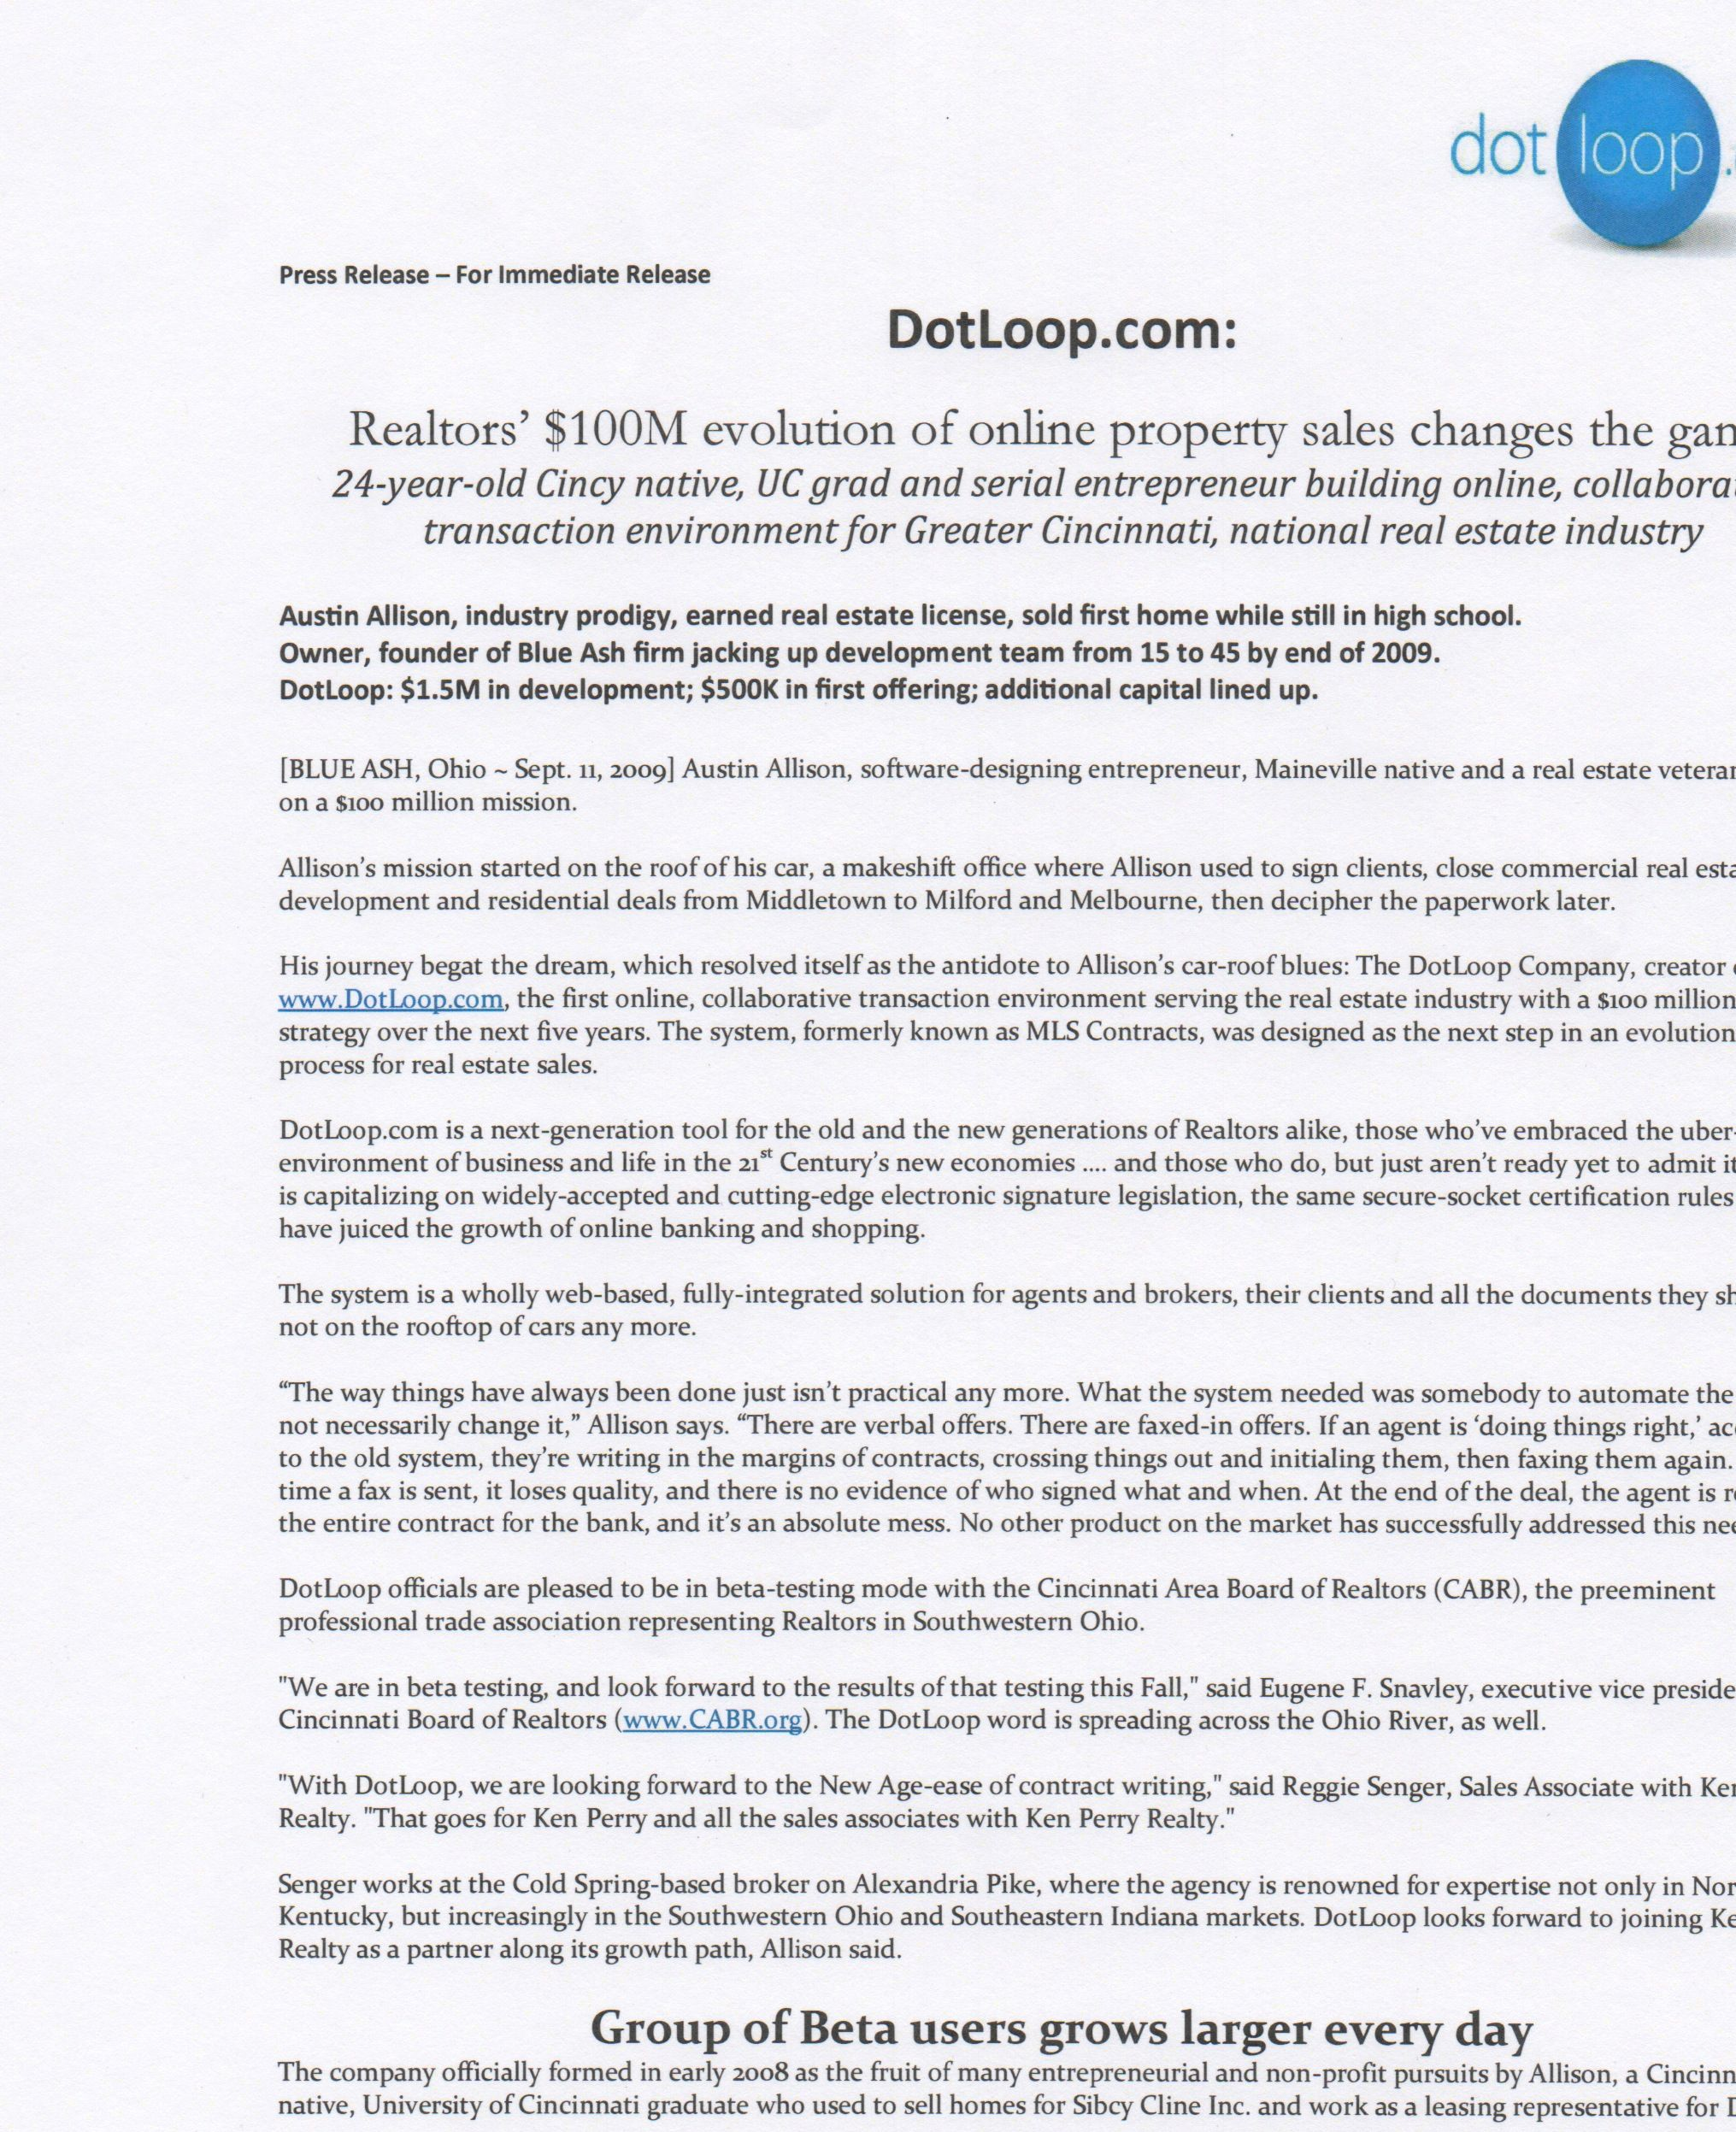 1st Press Release Written For Dotloop Sept 2009 Press Release